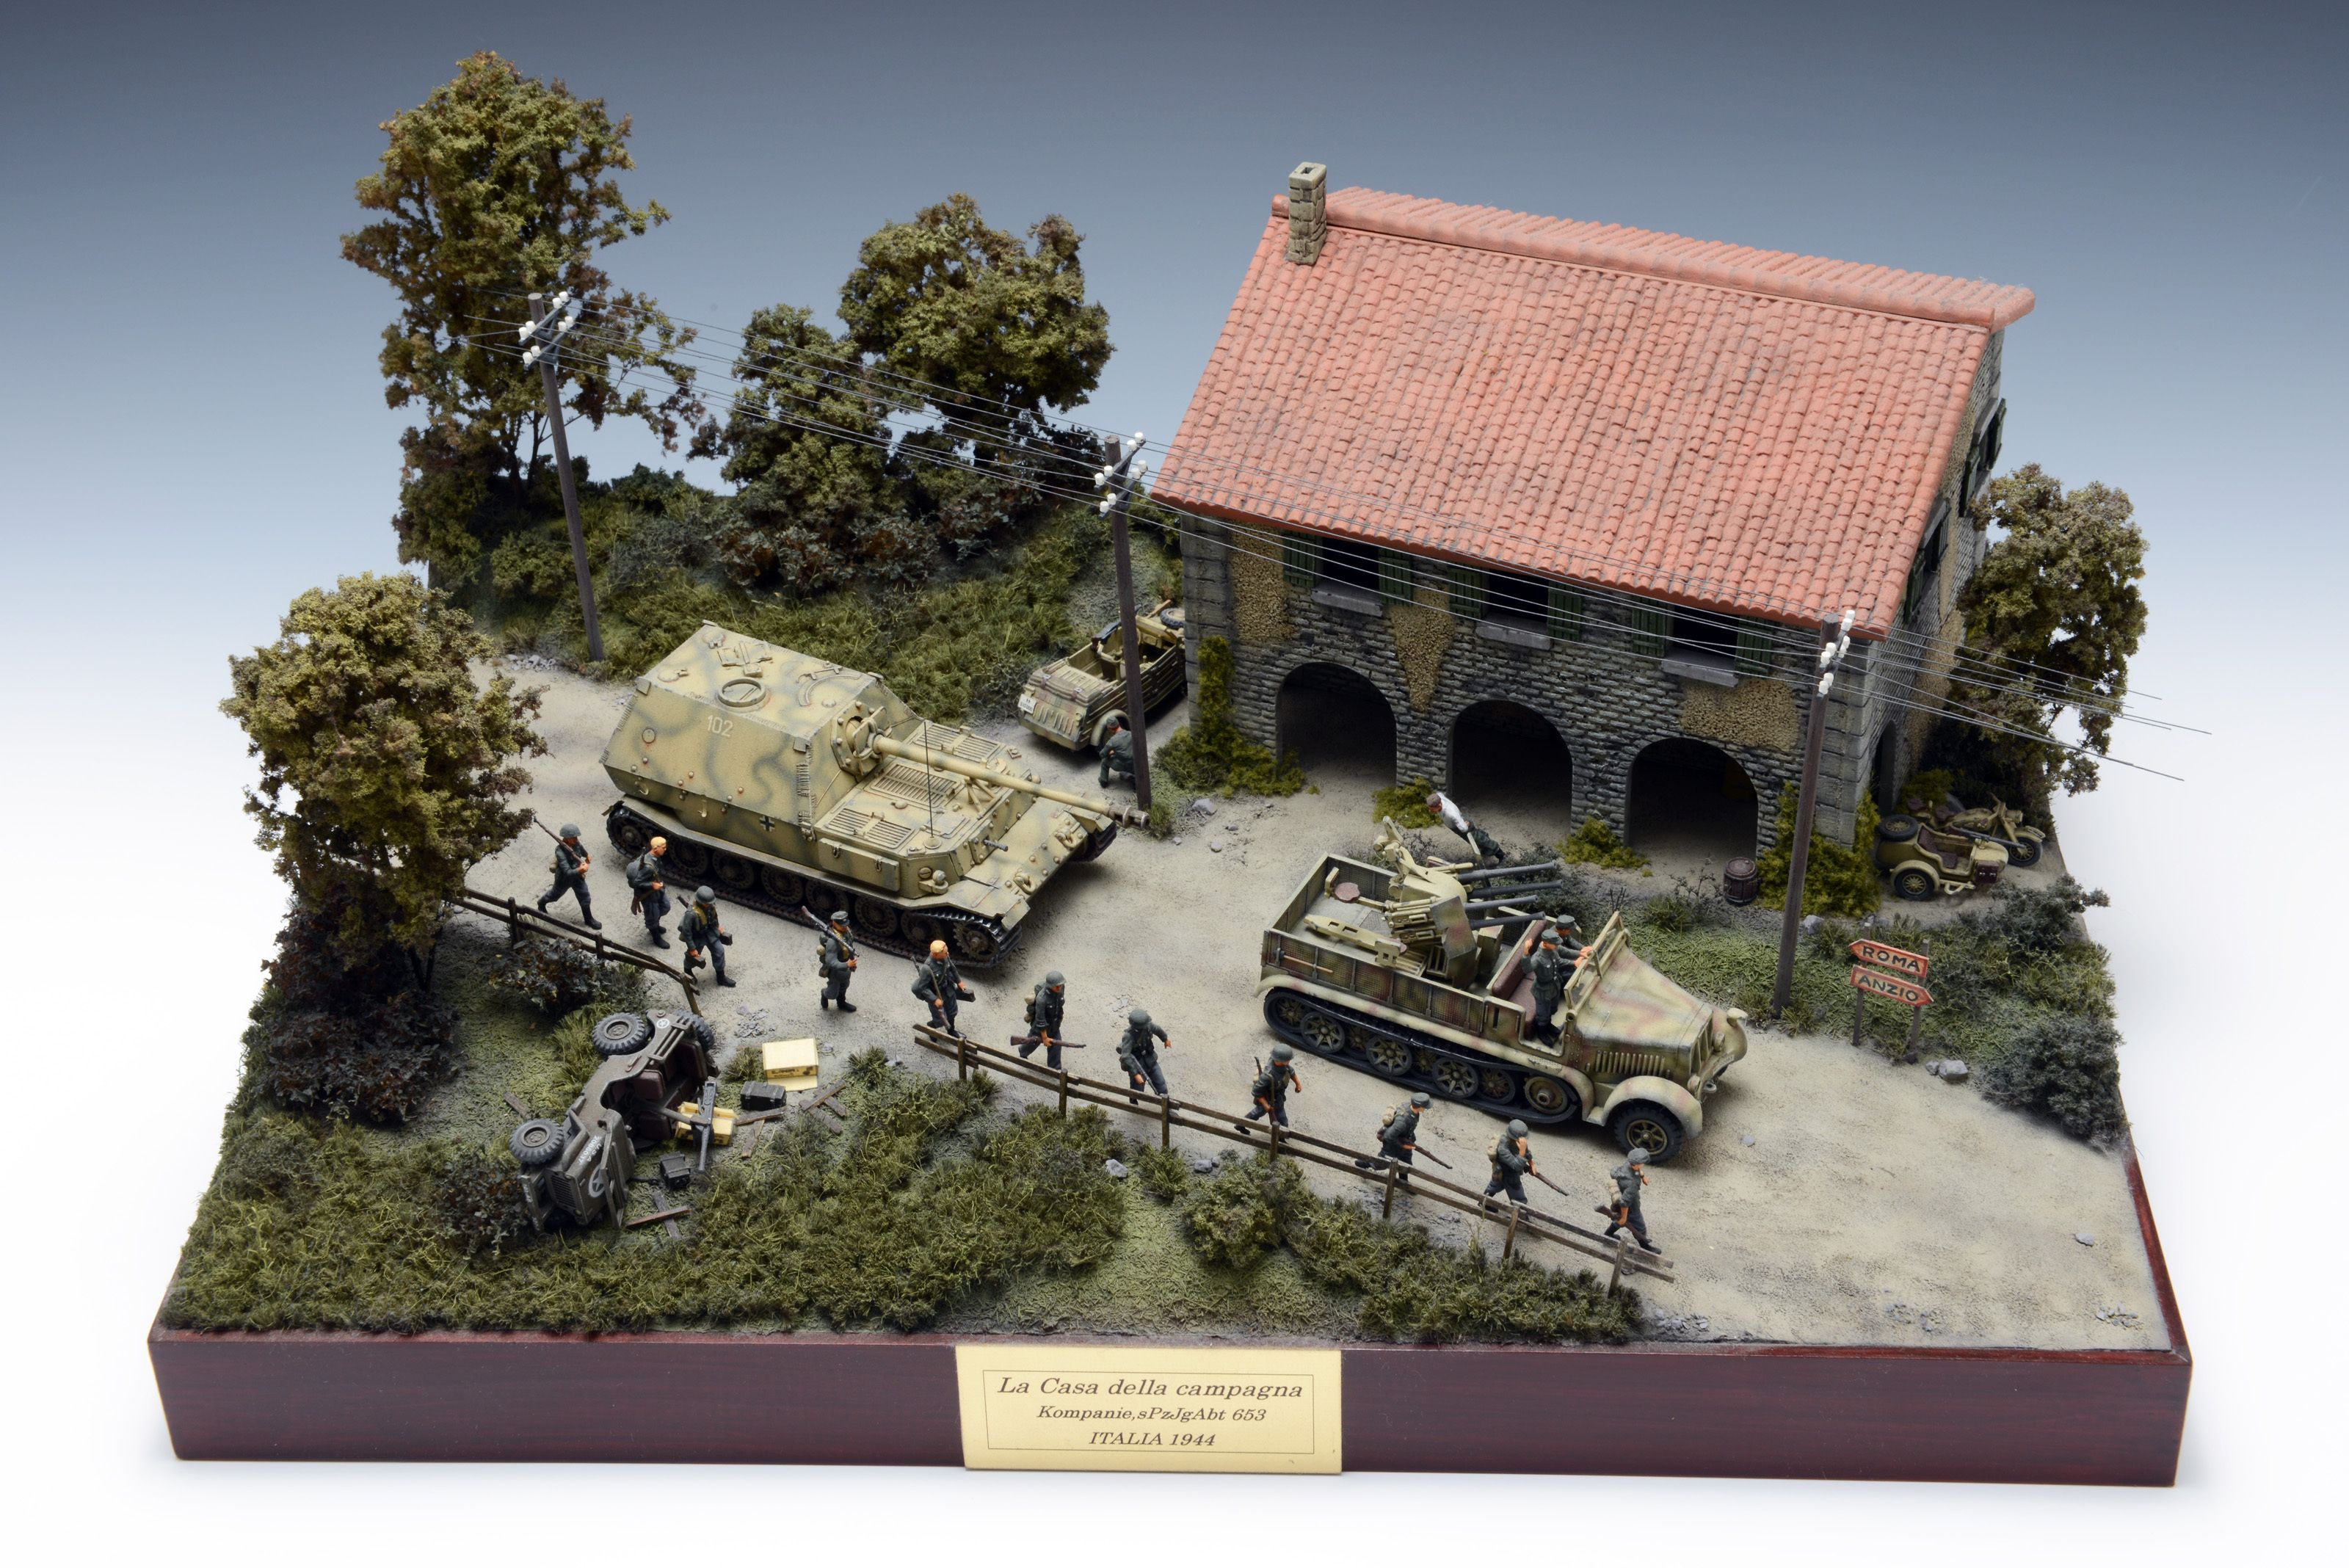 Pin By Serg Zabolotskij On Dioramas Military Military Diorama Model Tanks Paper Tanks